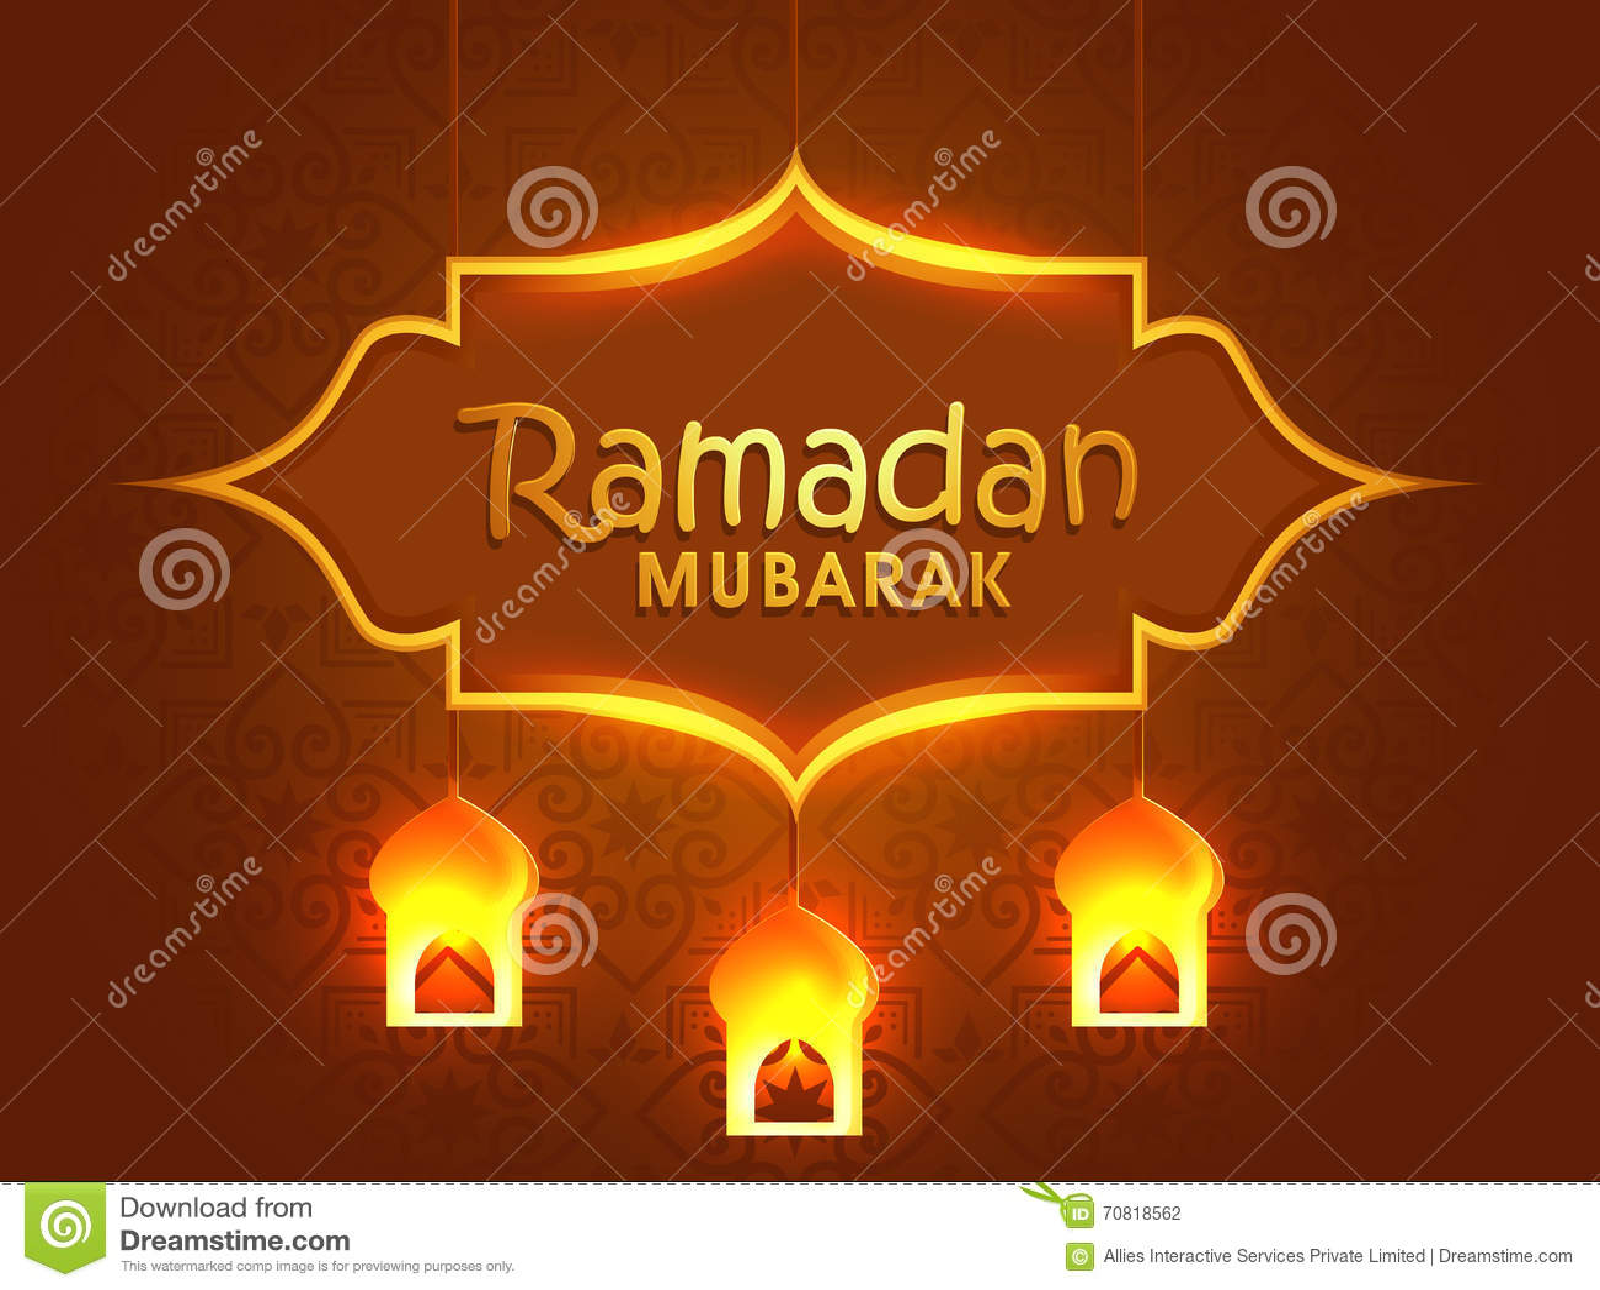 Greeting card design for ramadan mubarak stock illustration greeting card design for ramadan mubarak m4hsunfo